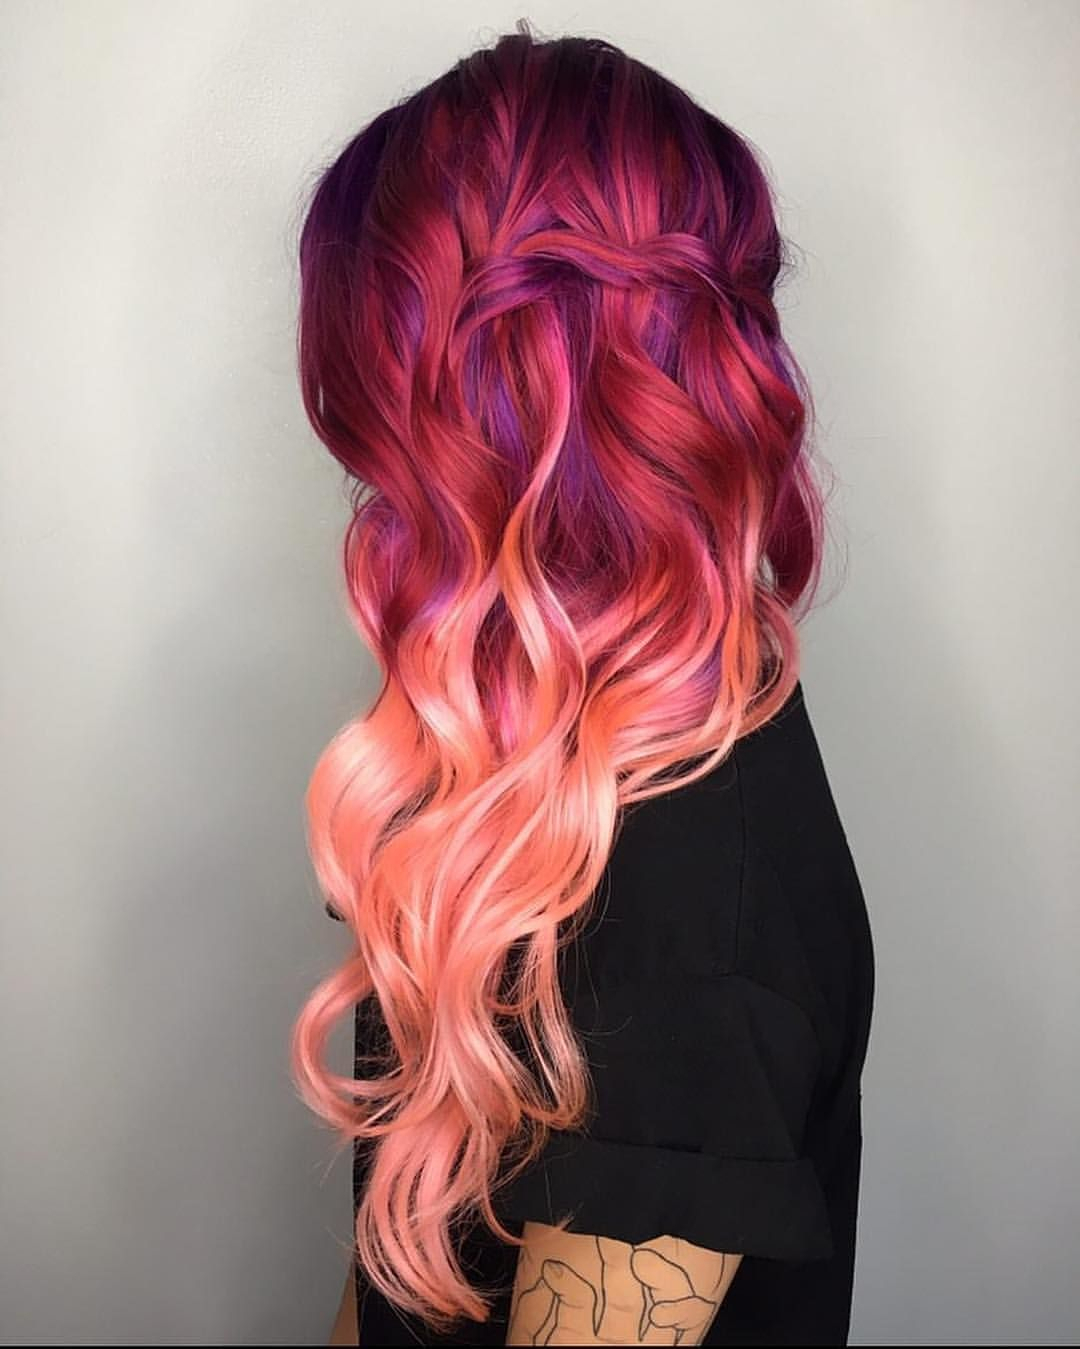 10 Cute Fun Red Hair Color Ideas pine2929ce292a9e2929c on e29d83dyed haire29d83 pinterest hair styles dyed hair 2020